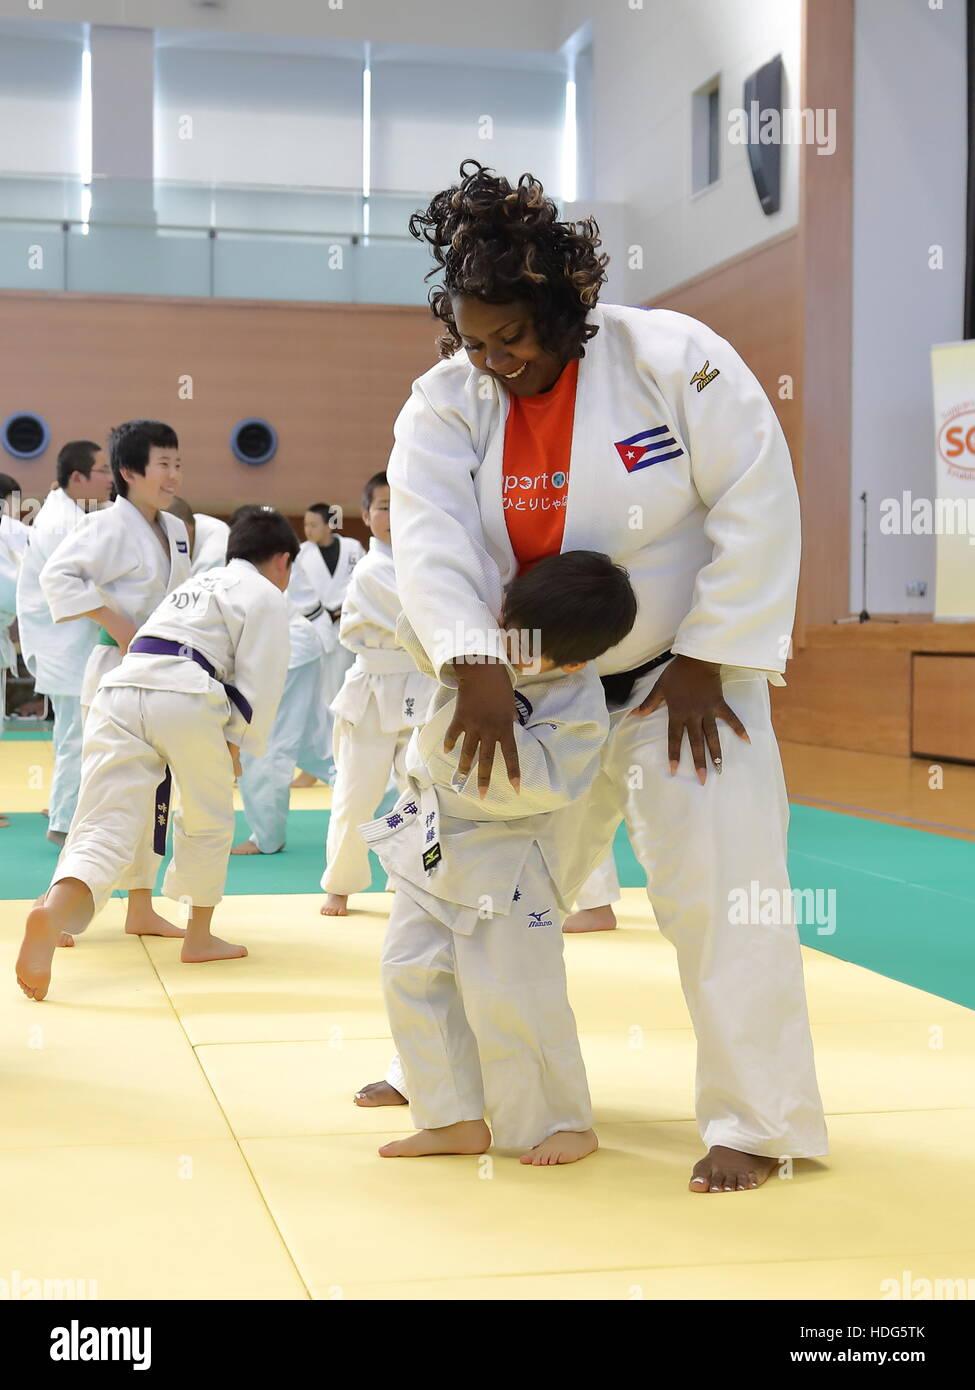 2016 Rio Olympics Women's Silver medalist Idalys Ortiz of